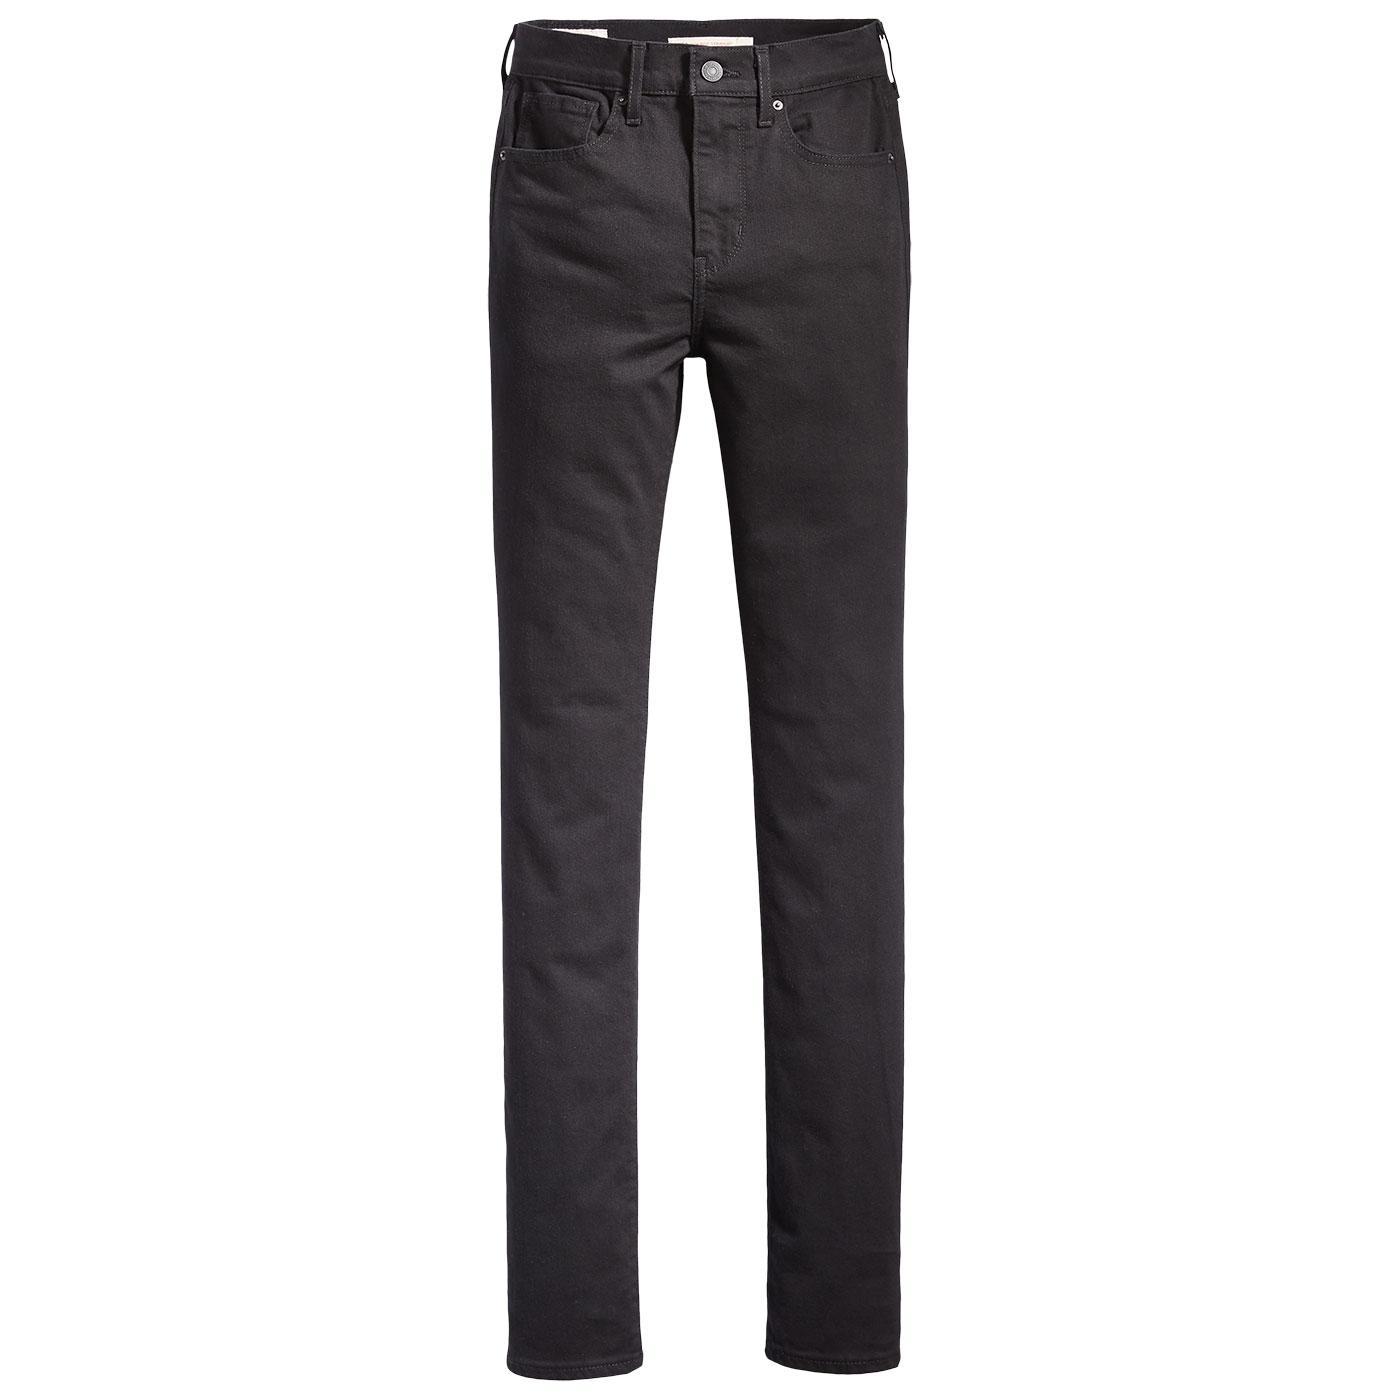 LEVI'S Women's High Rise Straight Jeans - Black